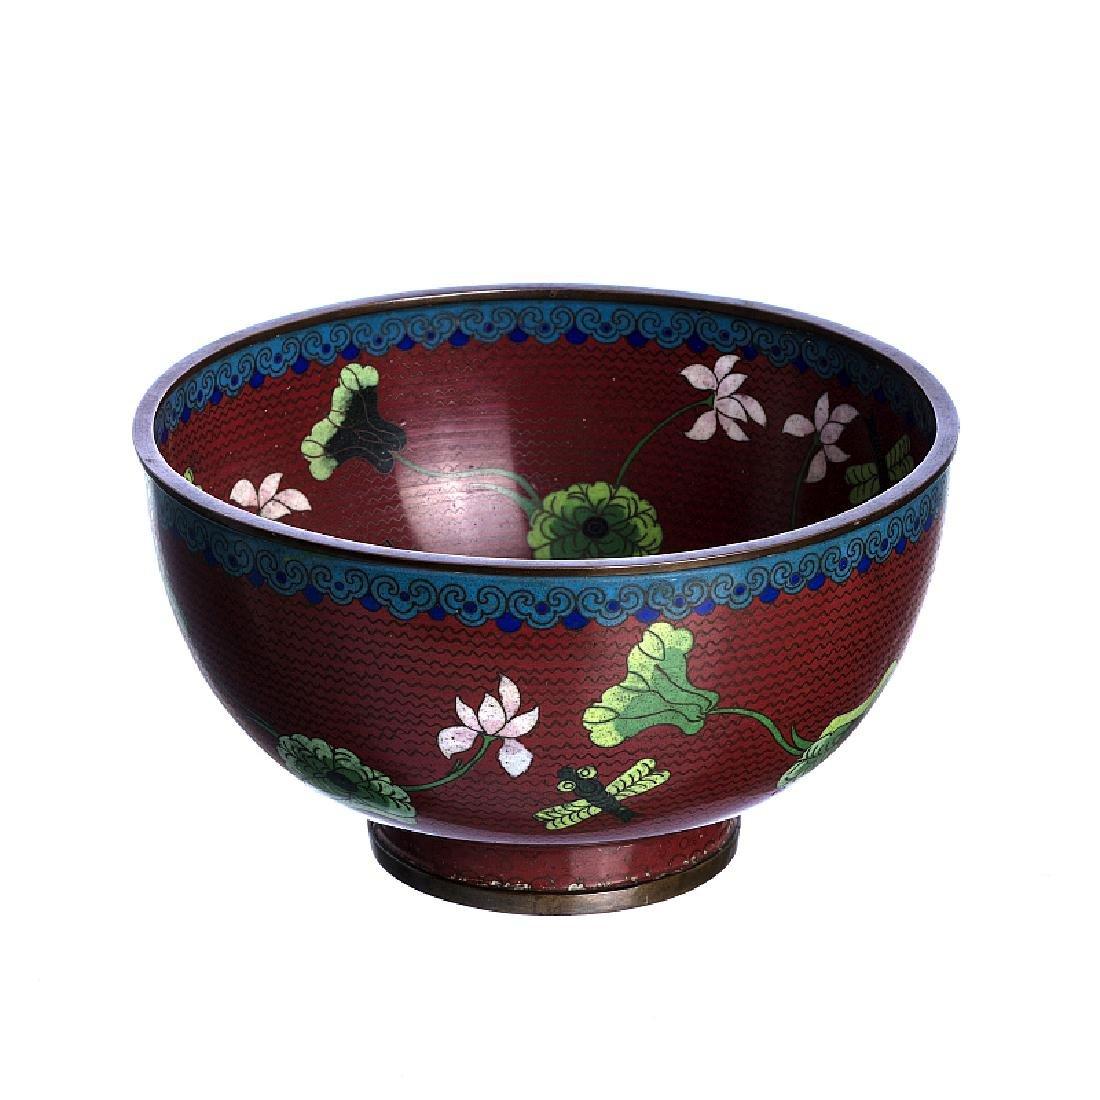 Chinese cloisonné bowl, Minguo